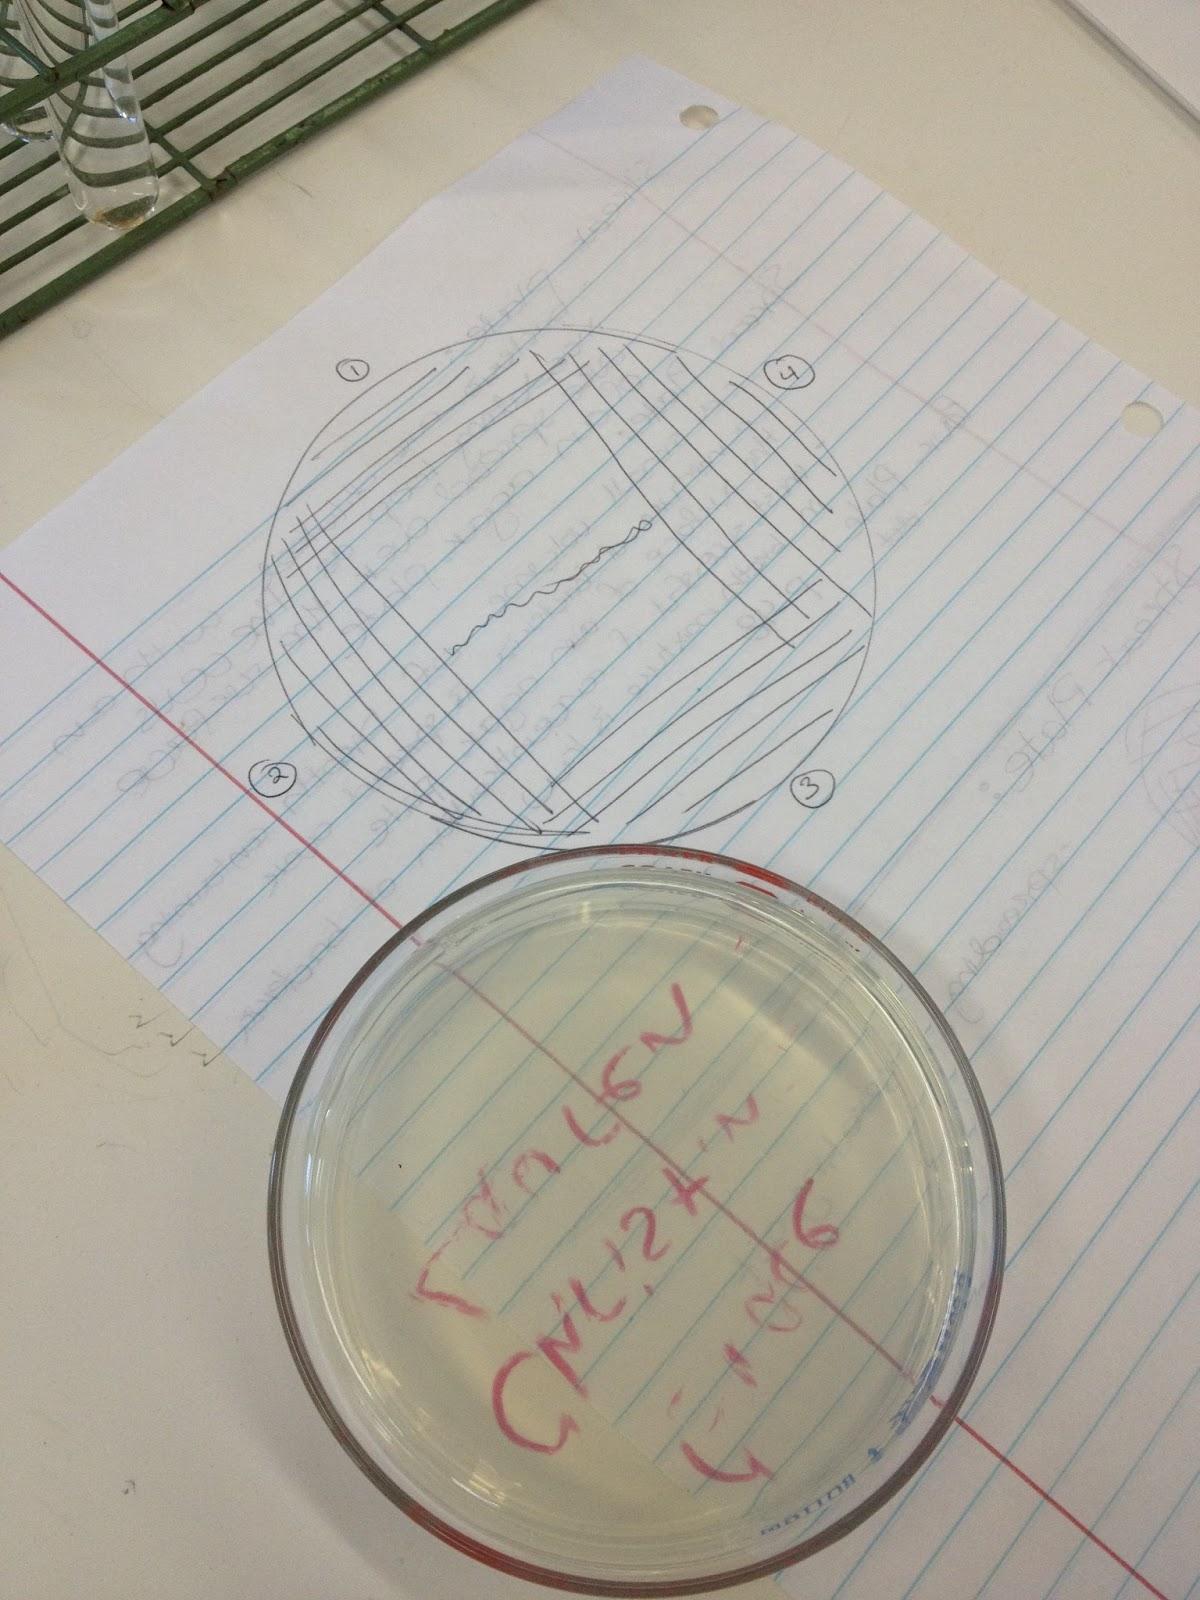 how to prepare agar slant